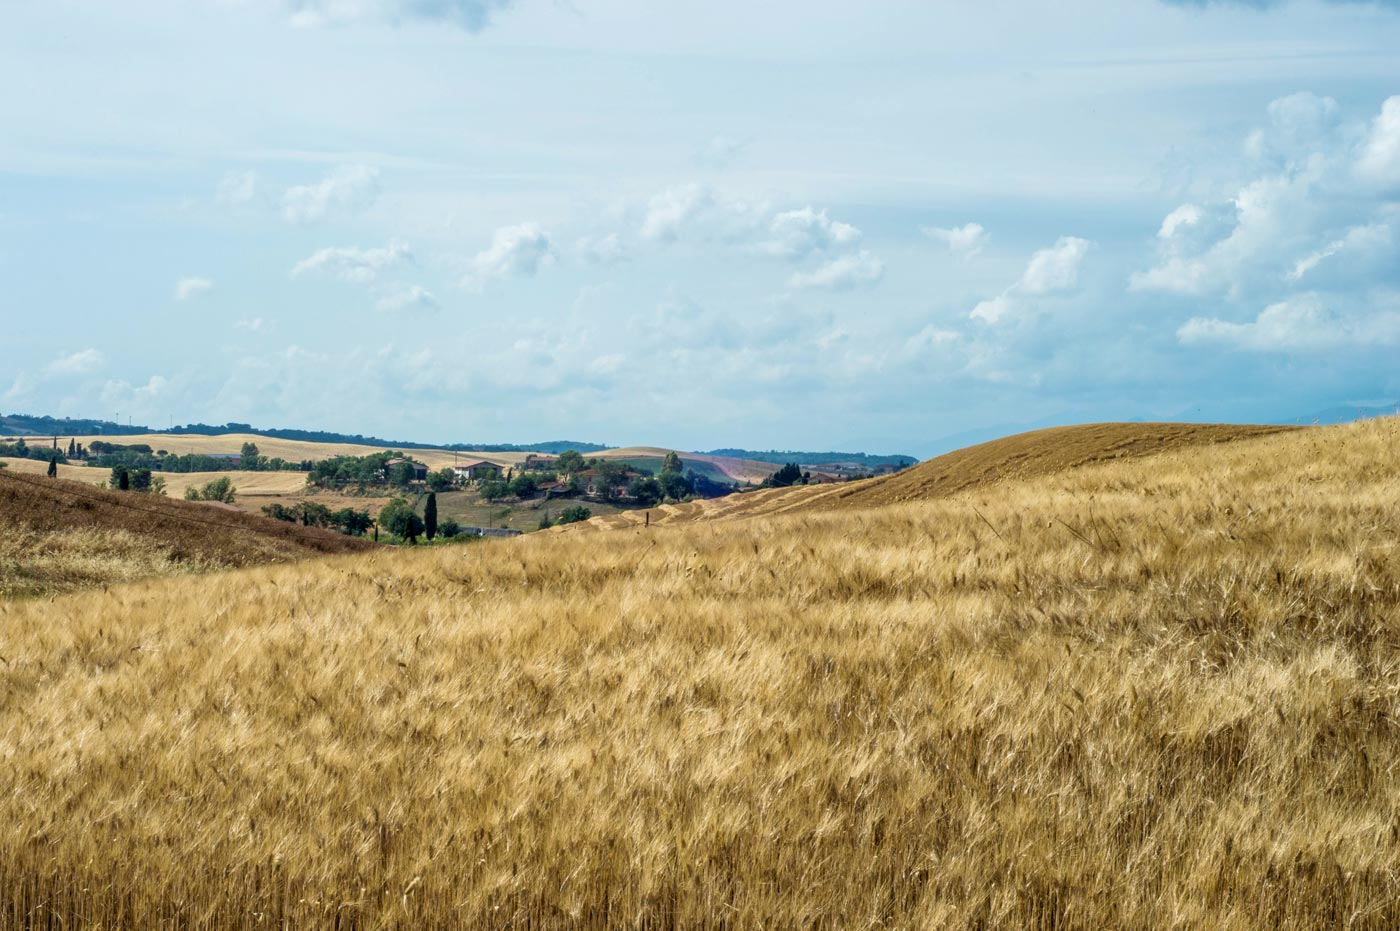 Wheat fields in Tuscany